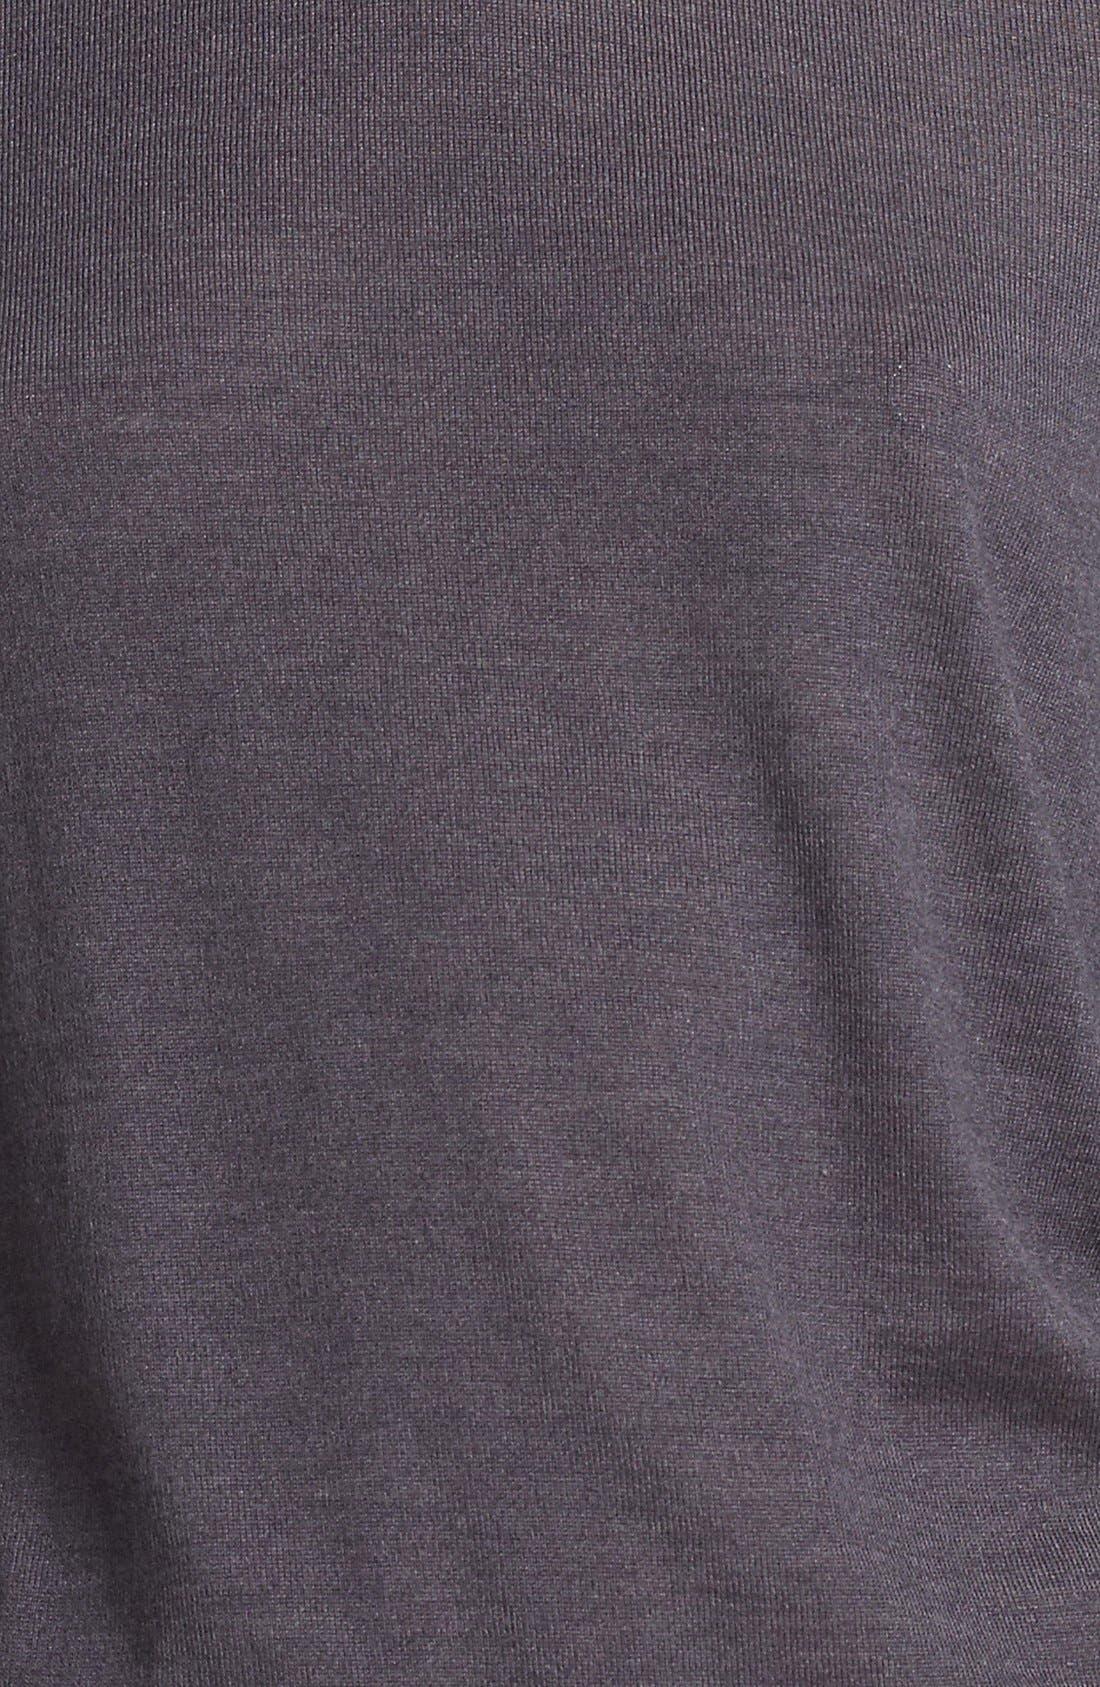 Alternate Image 3  - Jil Sander Cashmere & Silk Crewneck Sweater